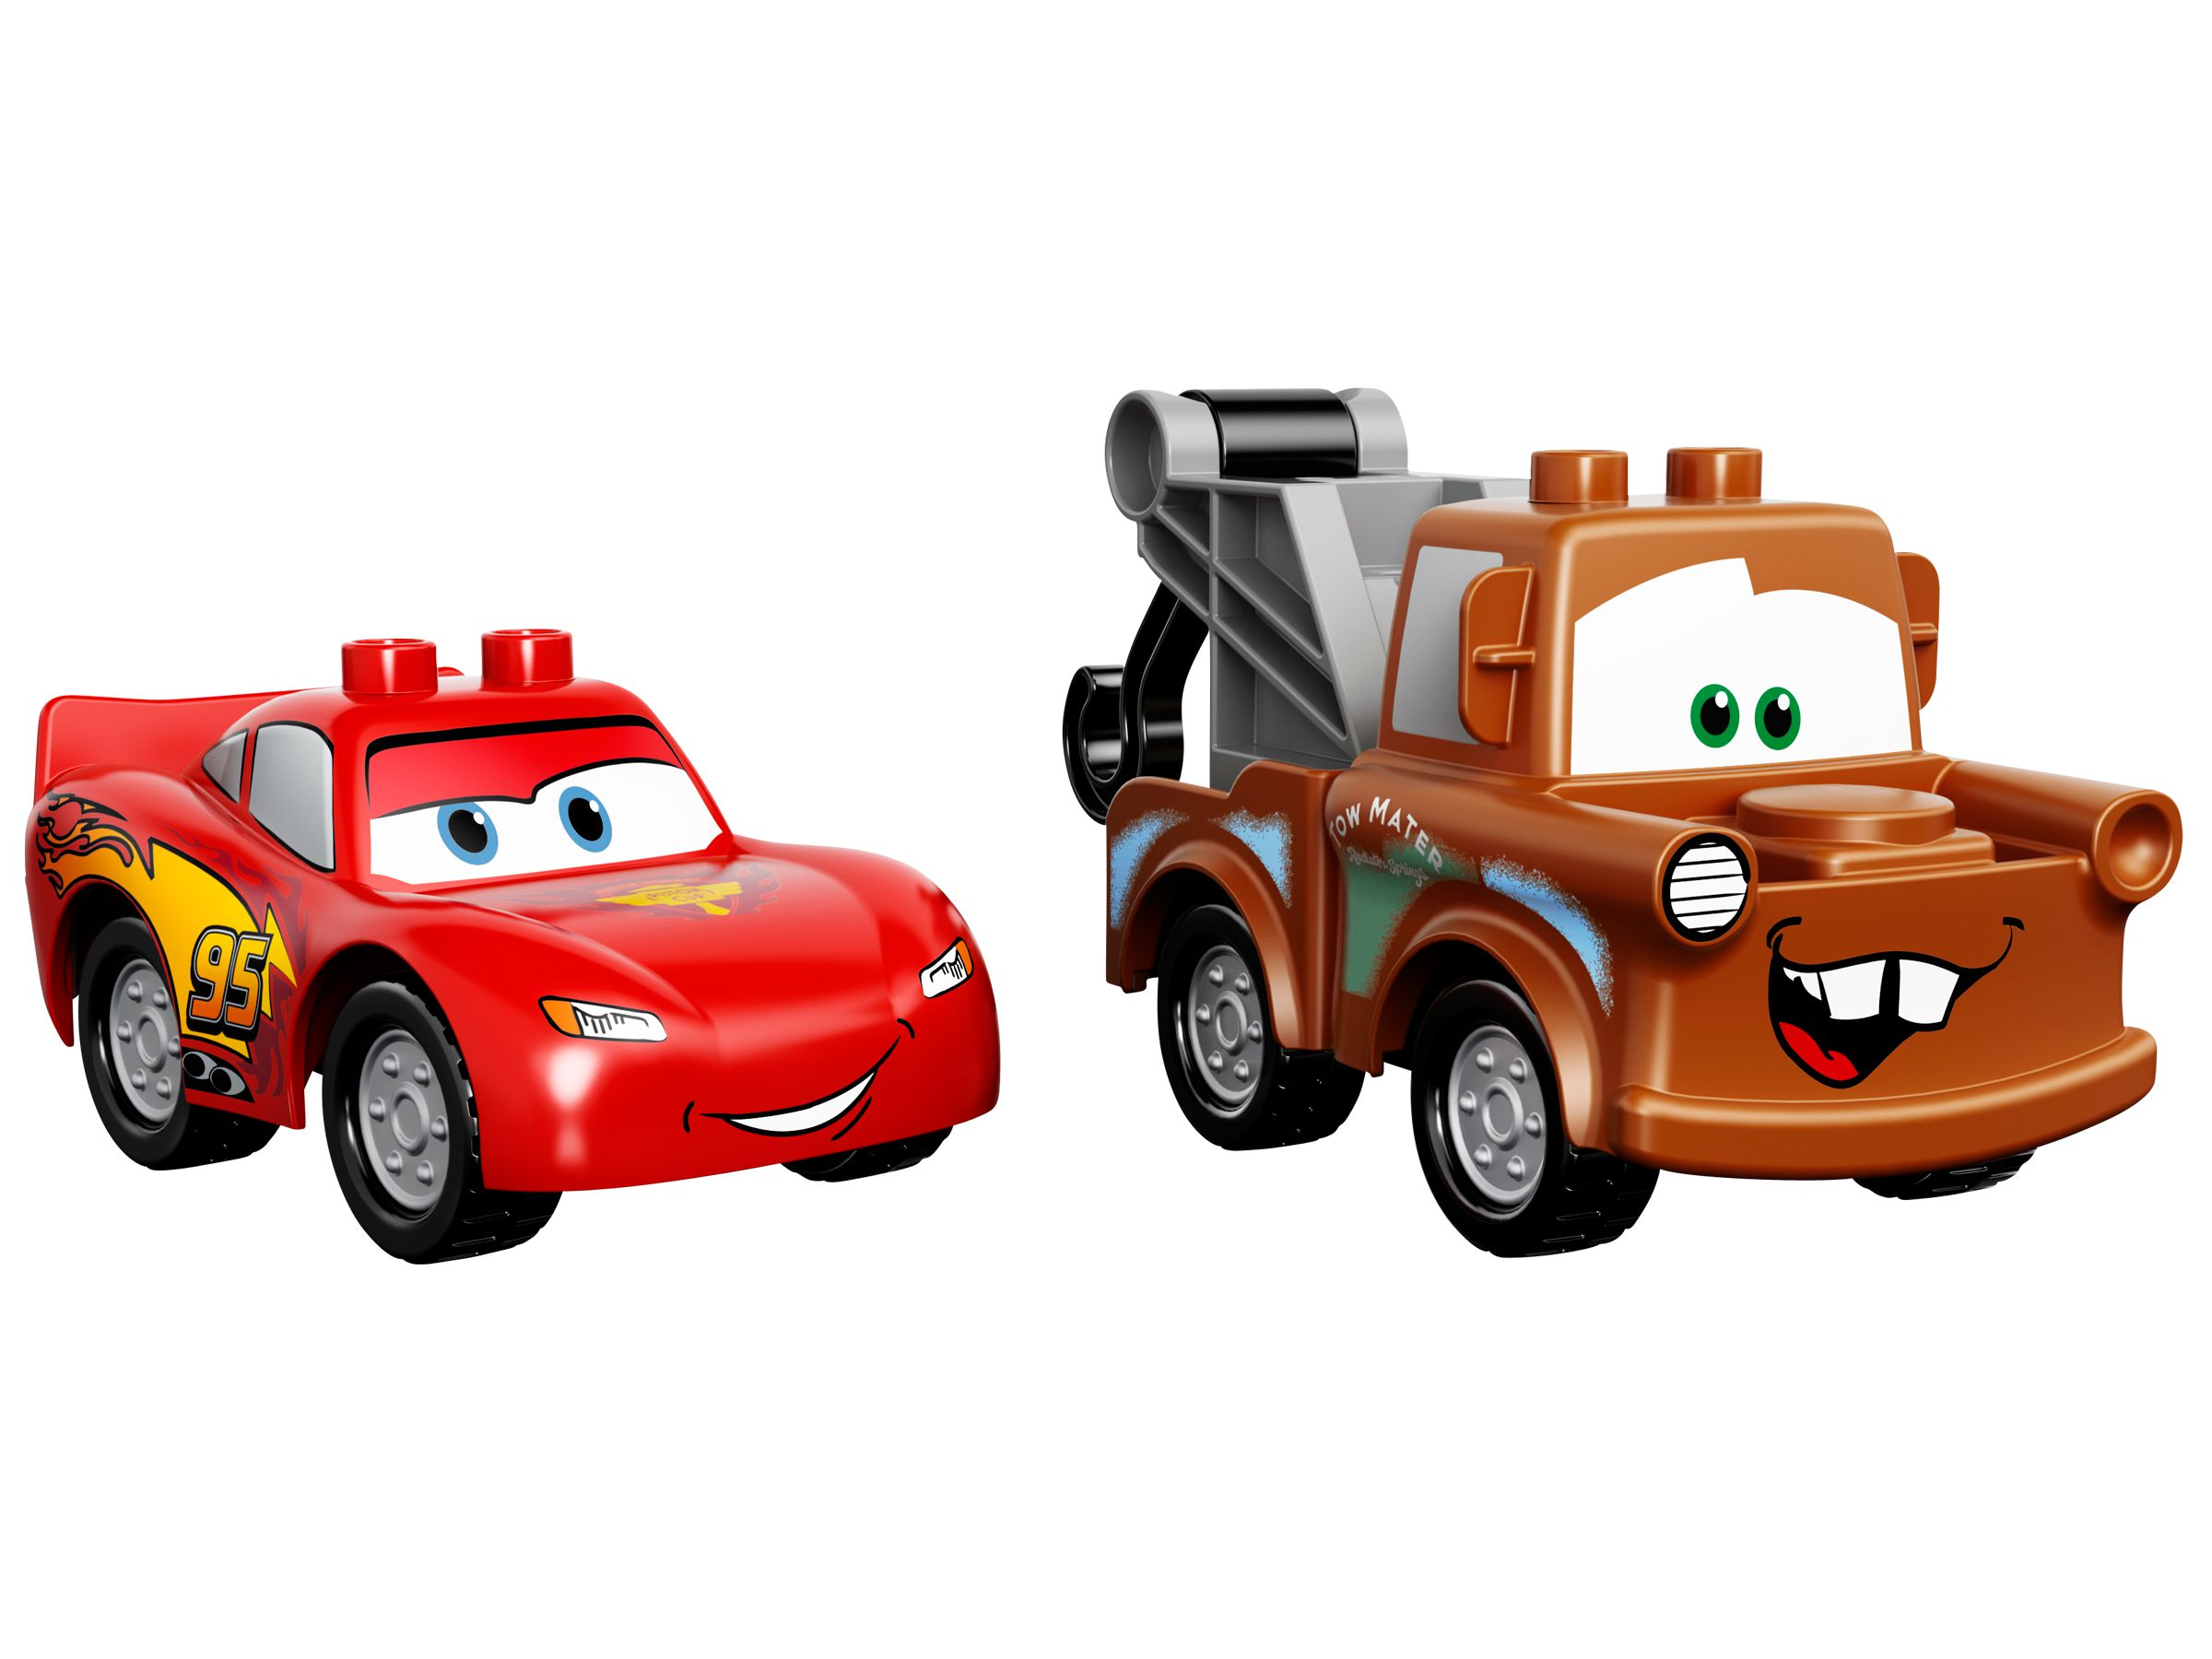 Lego Duplo Disney Pixar Cars Classic Race